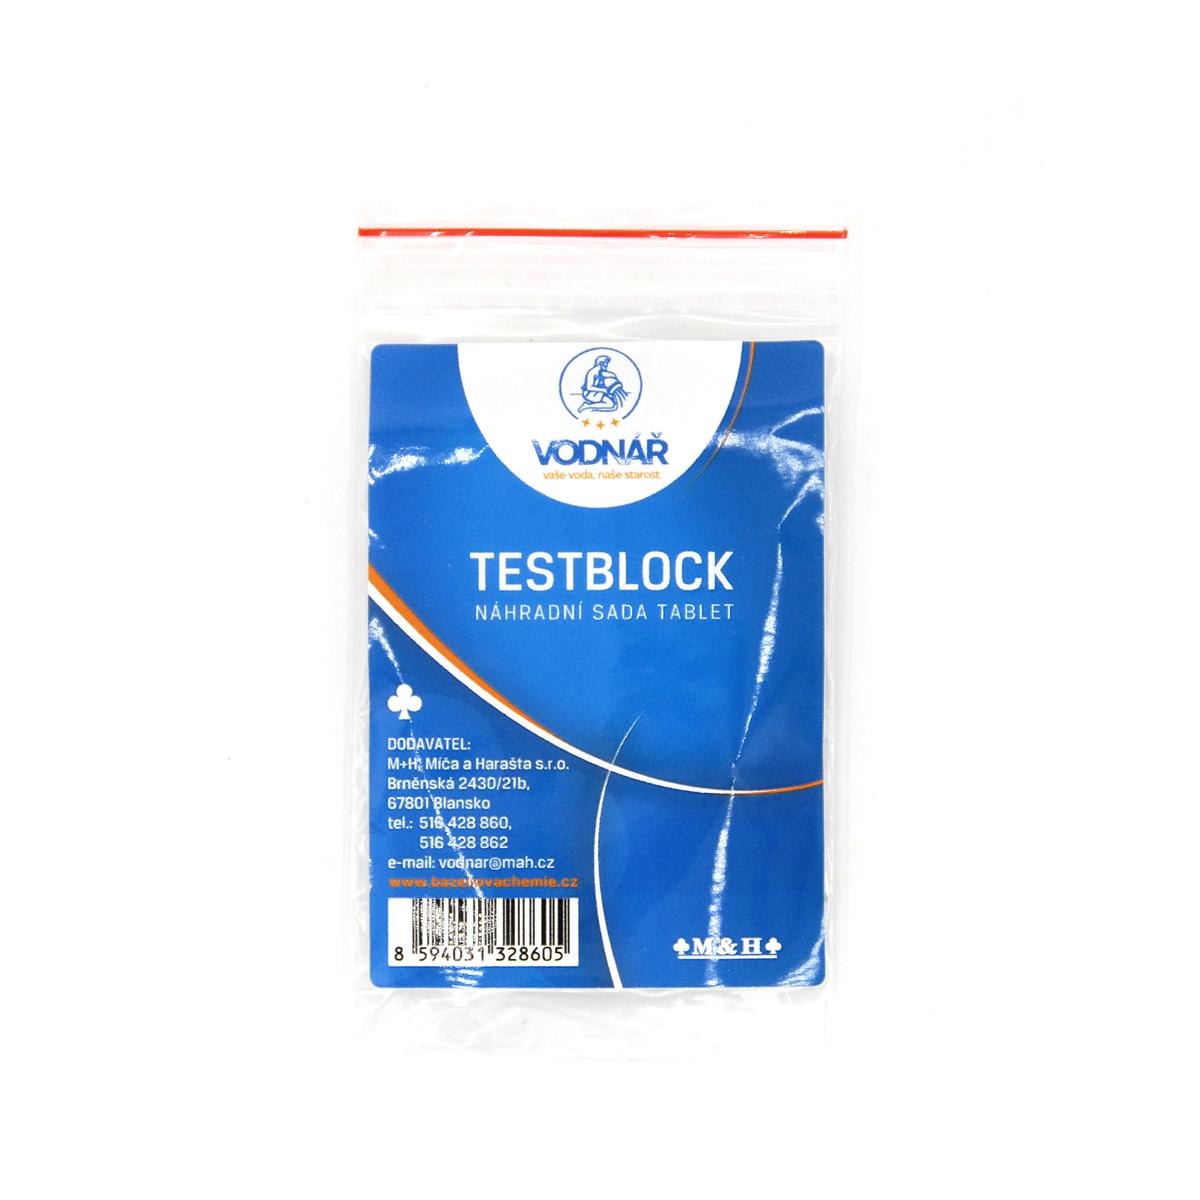 Vodnář Testblock náhradní sada tablet